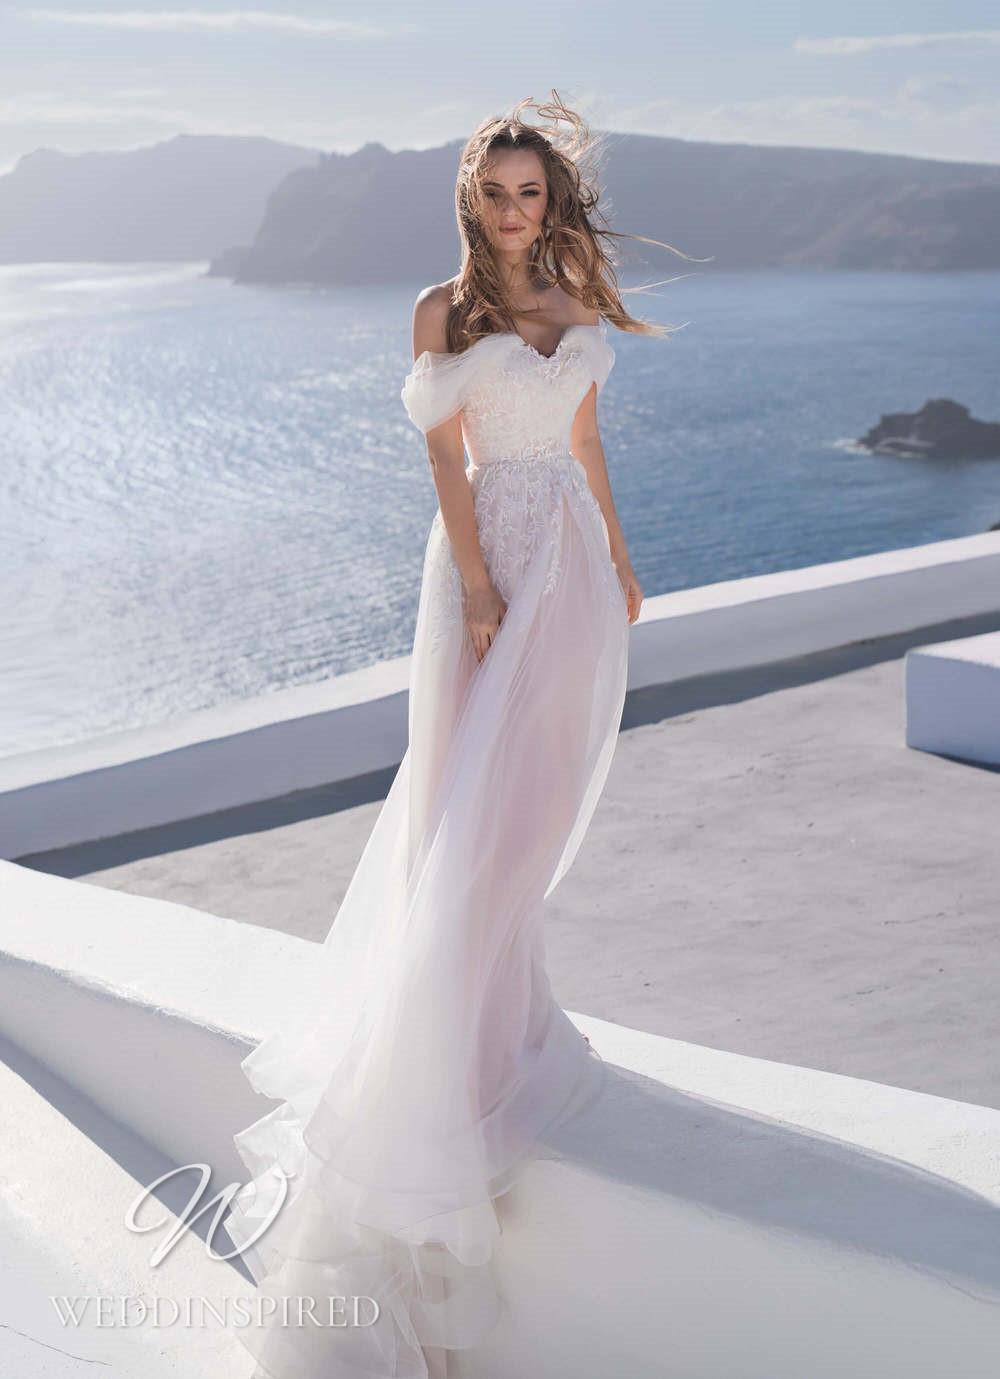 A Blunny 2021 flowy off the shoulder tulle A-line wedding dress